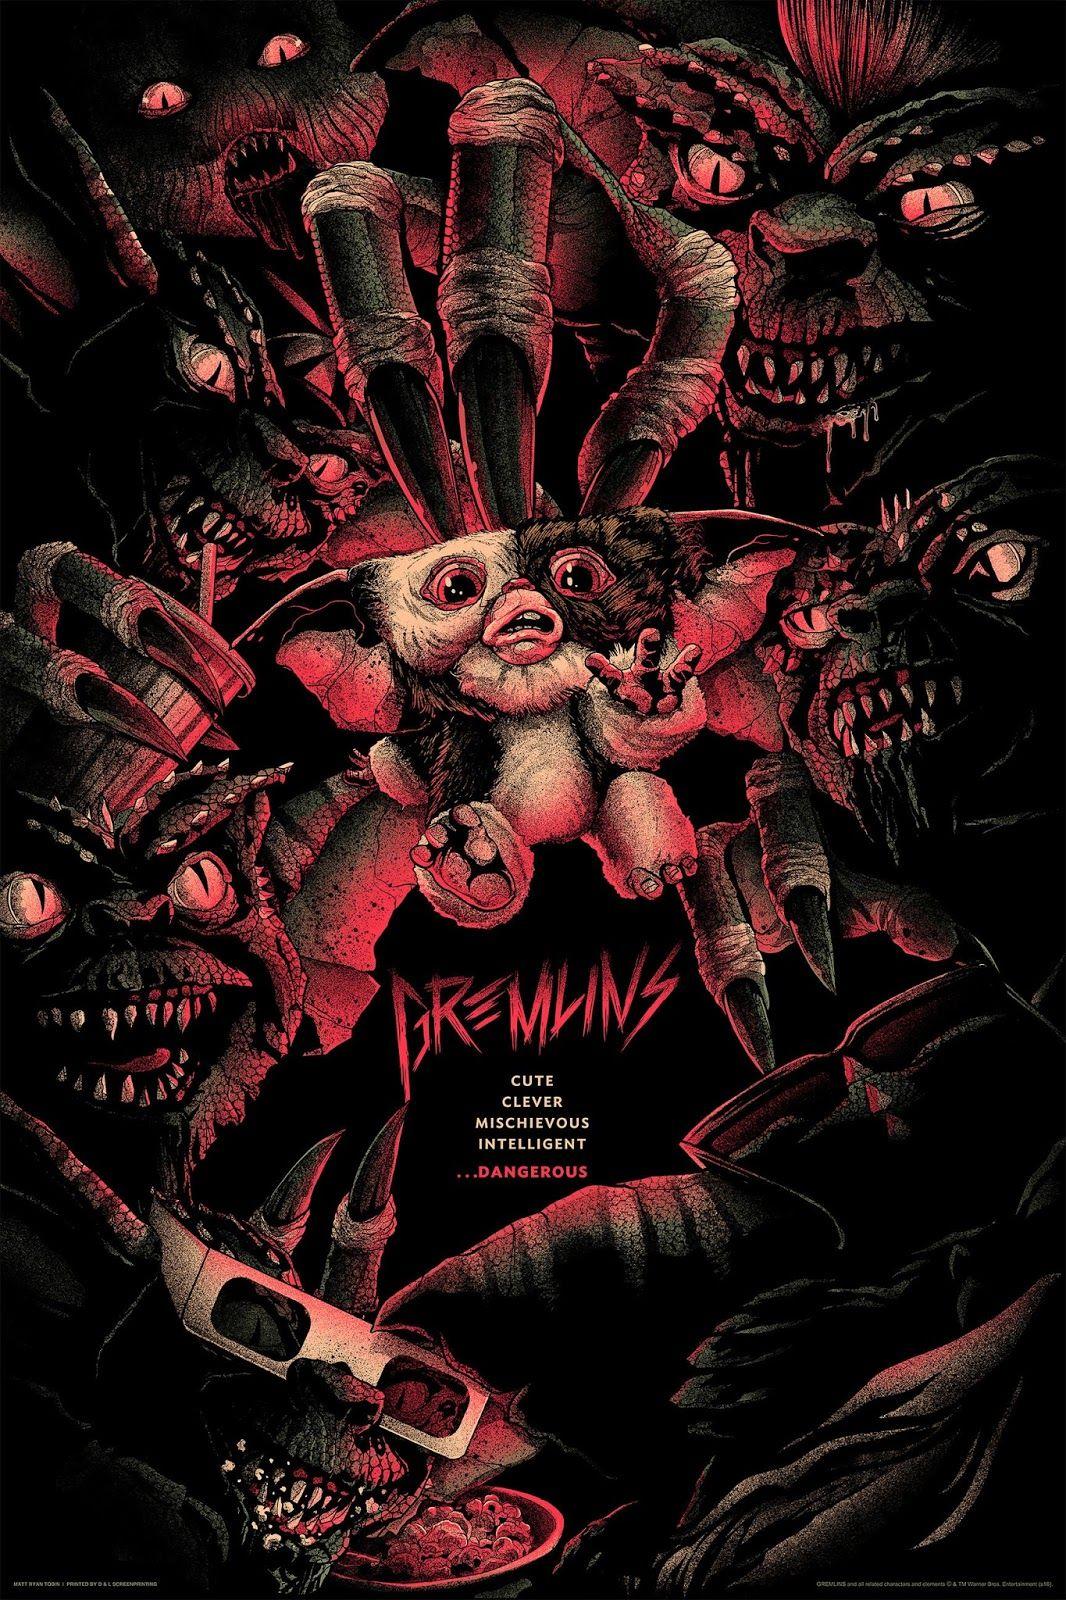 Gremlins Posters By Matt Ryan Tobin And Glen Brogan Release By Mondo Mondo Posters Movie Art Movie Posters